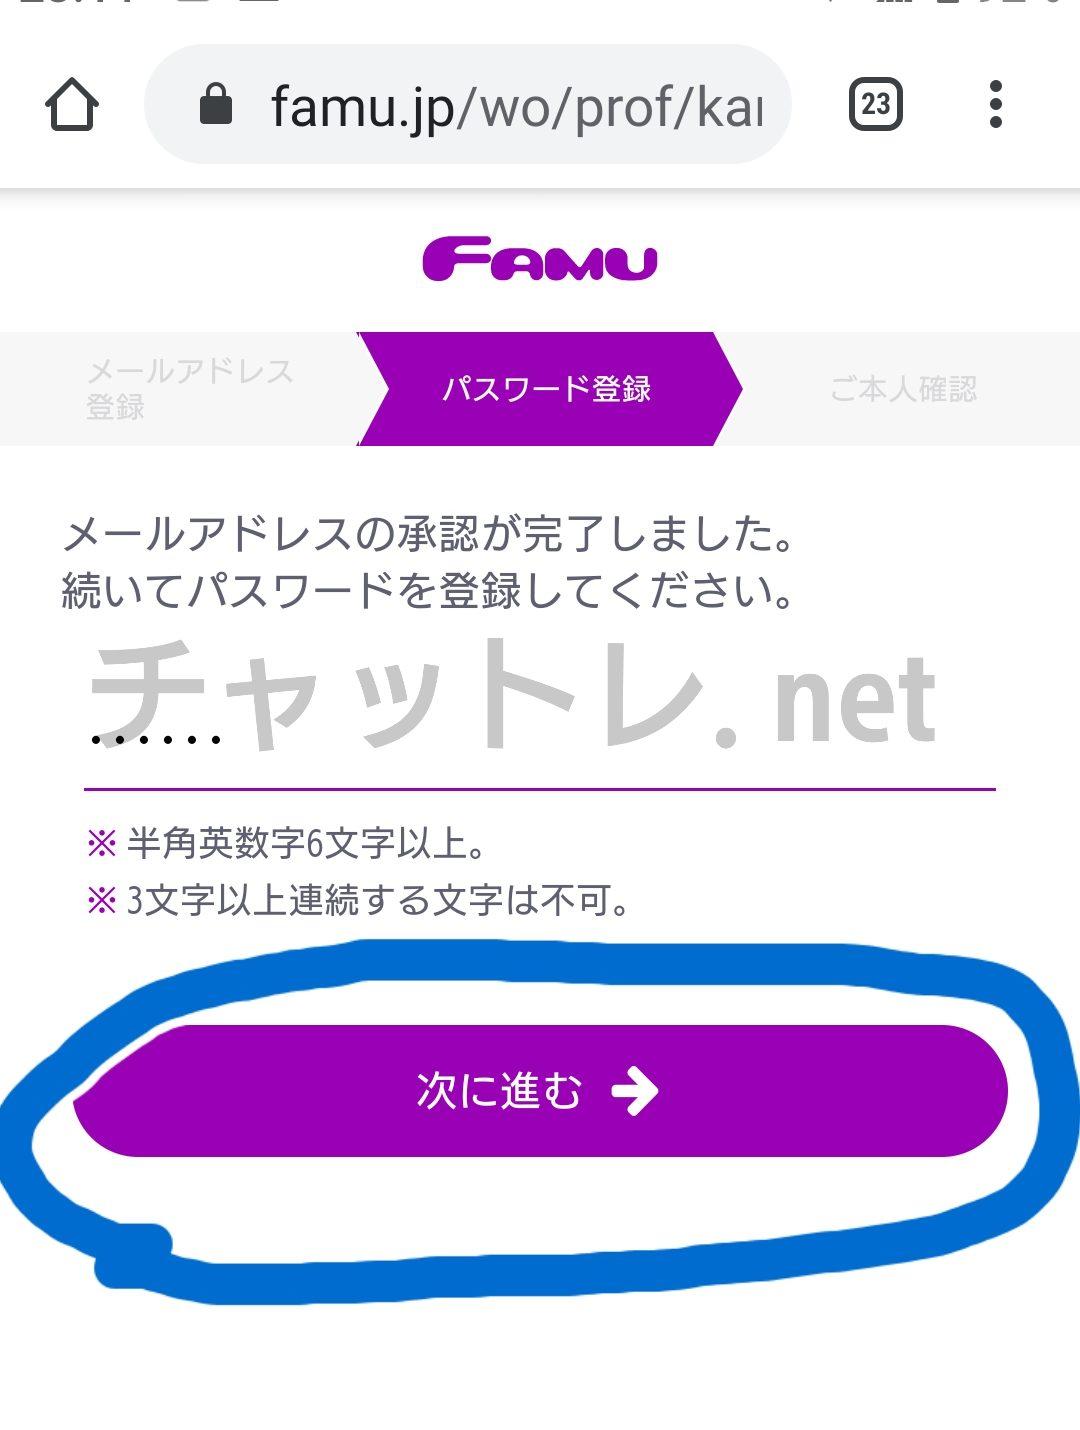 FAMU チャットレディ 登録 プレゼント